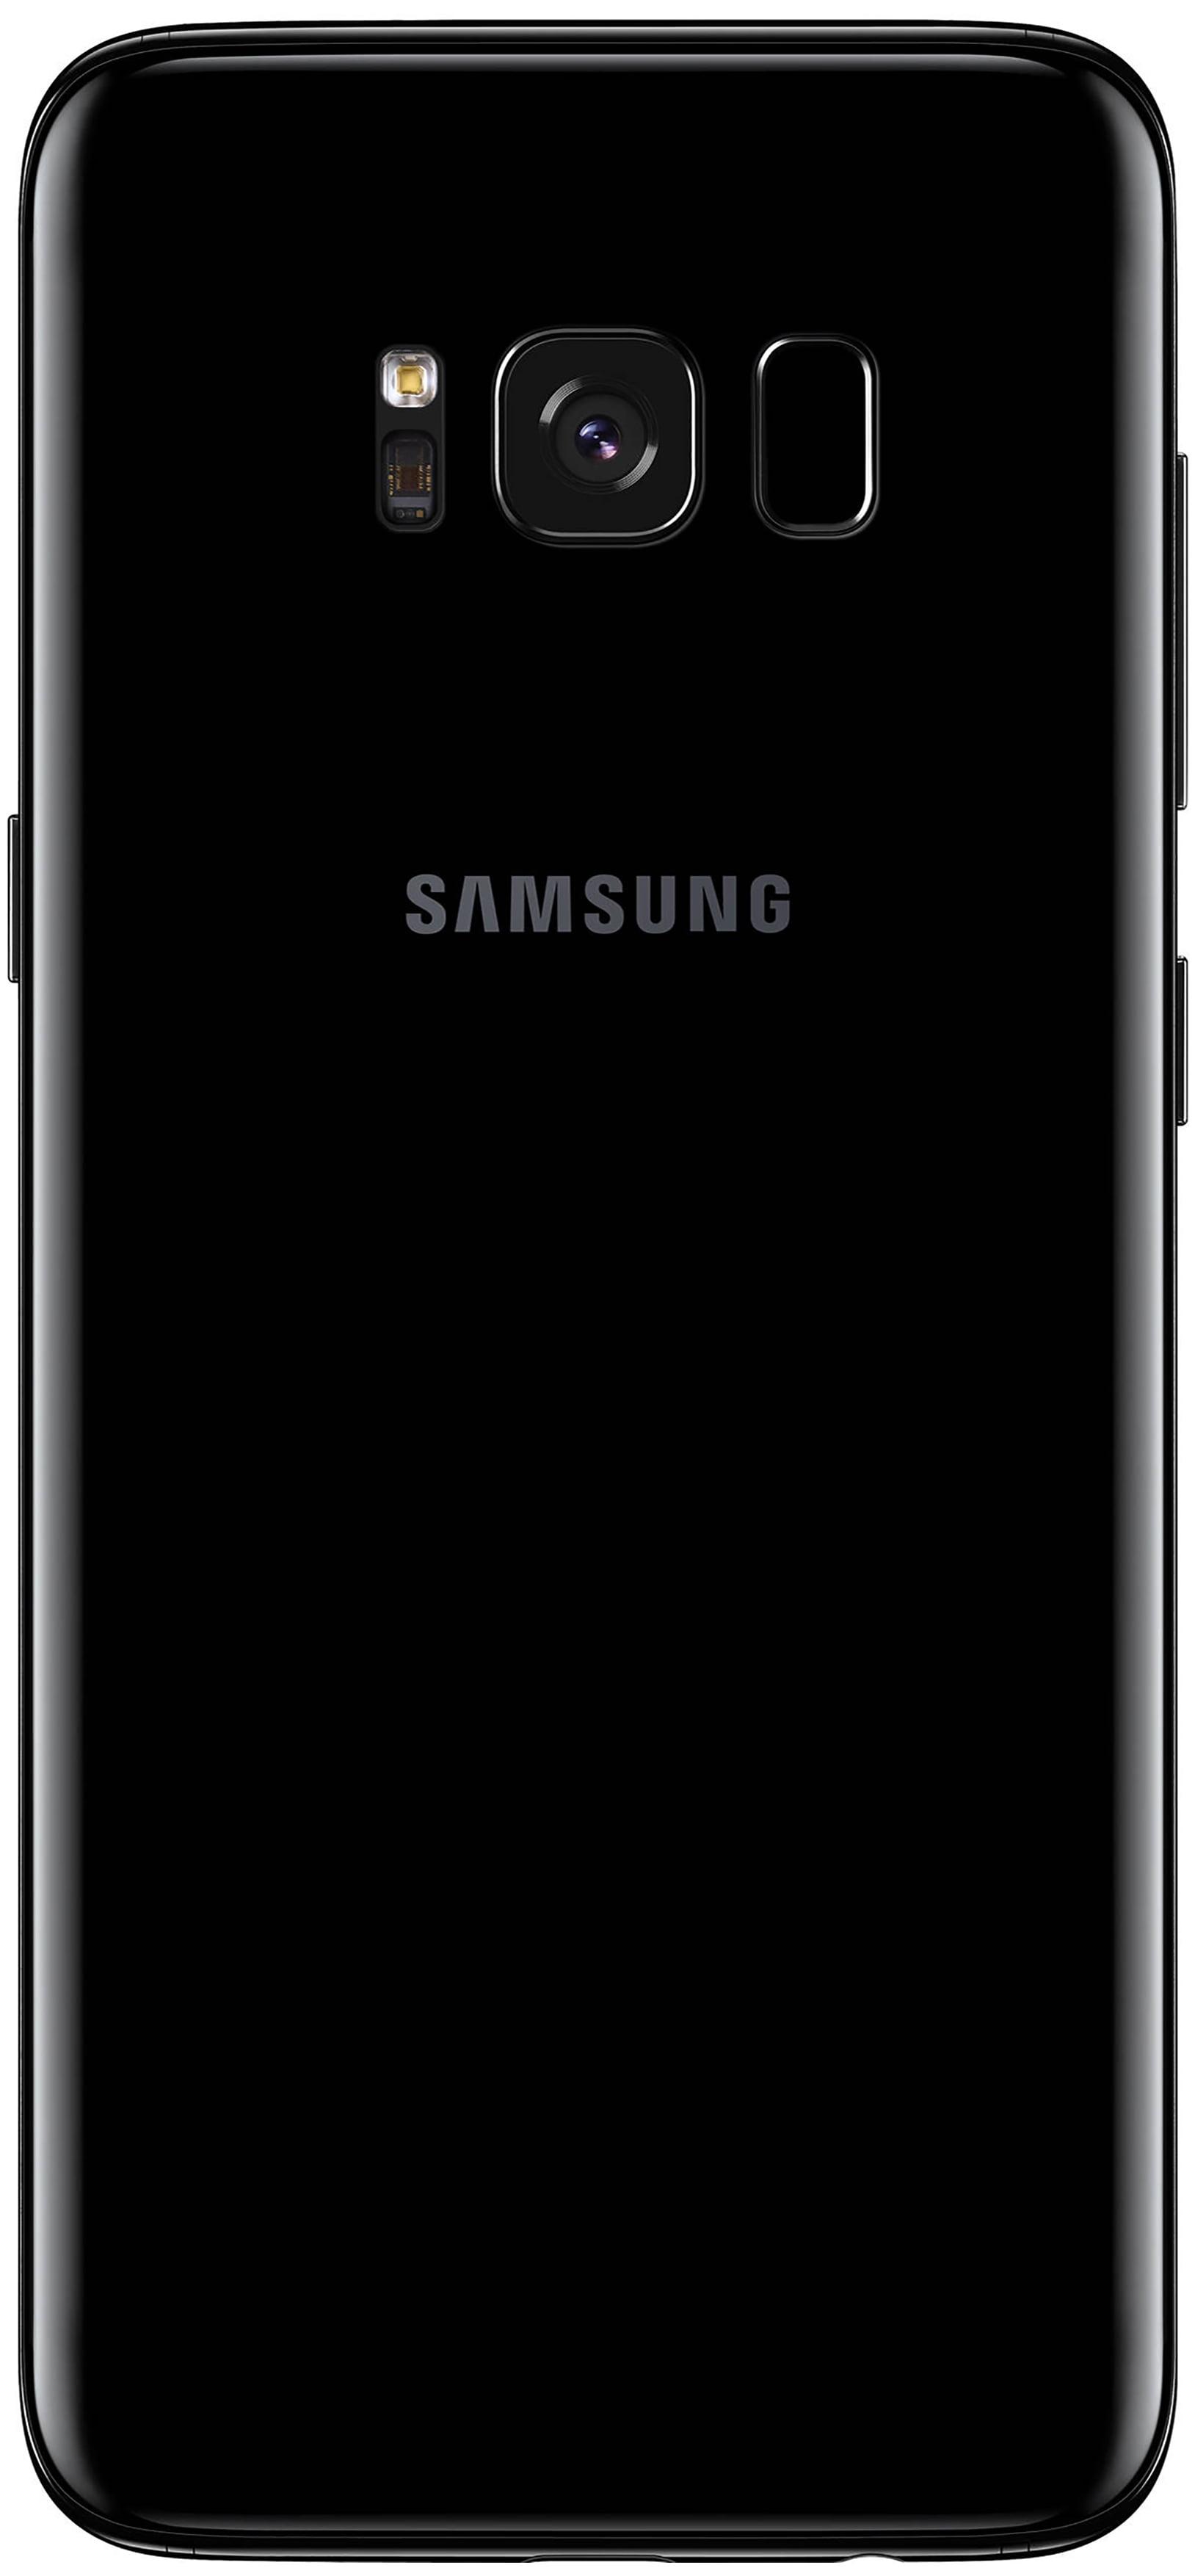 Samsung Galaxy S8 G950U 64GB Unlocked GSM U S  Version Phone